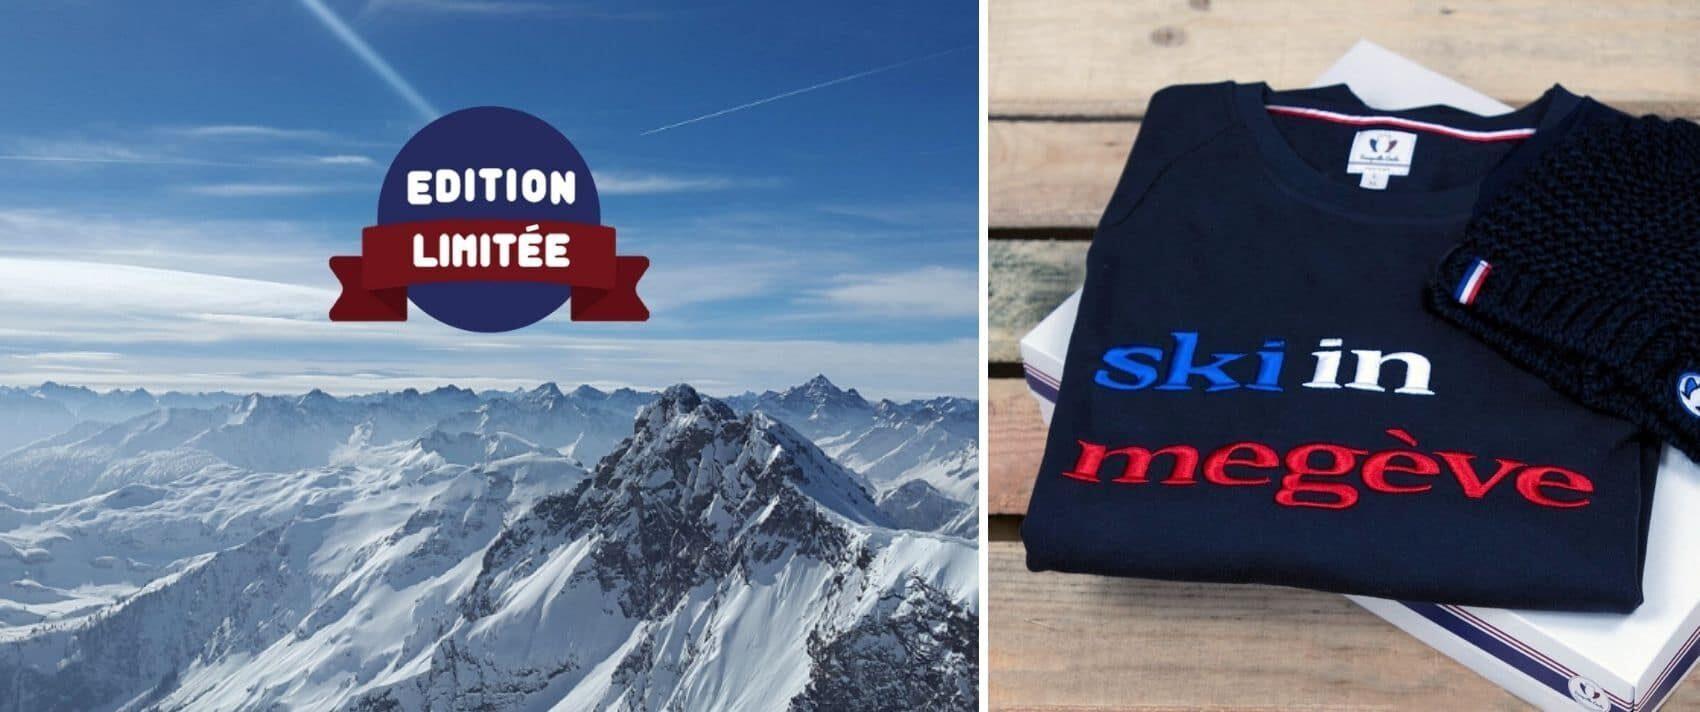 sweat-ski-in-megeve-banniere